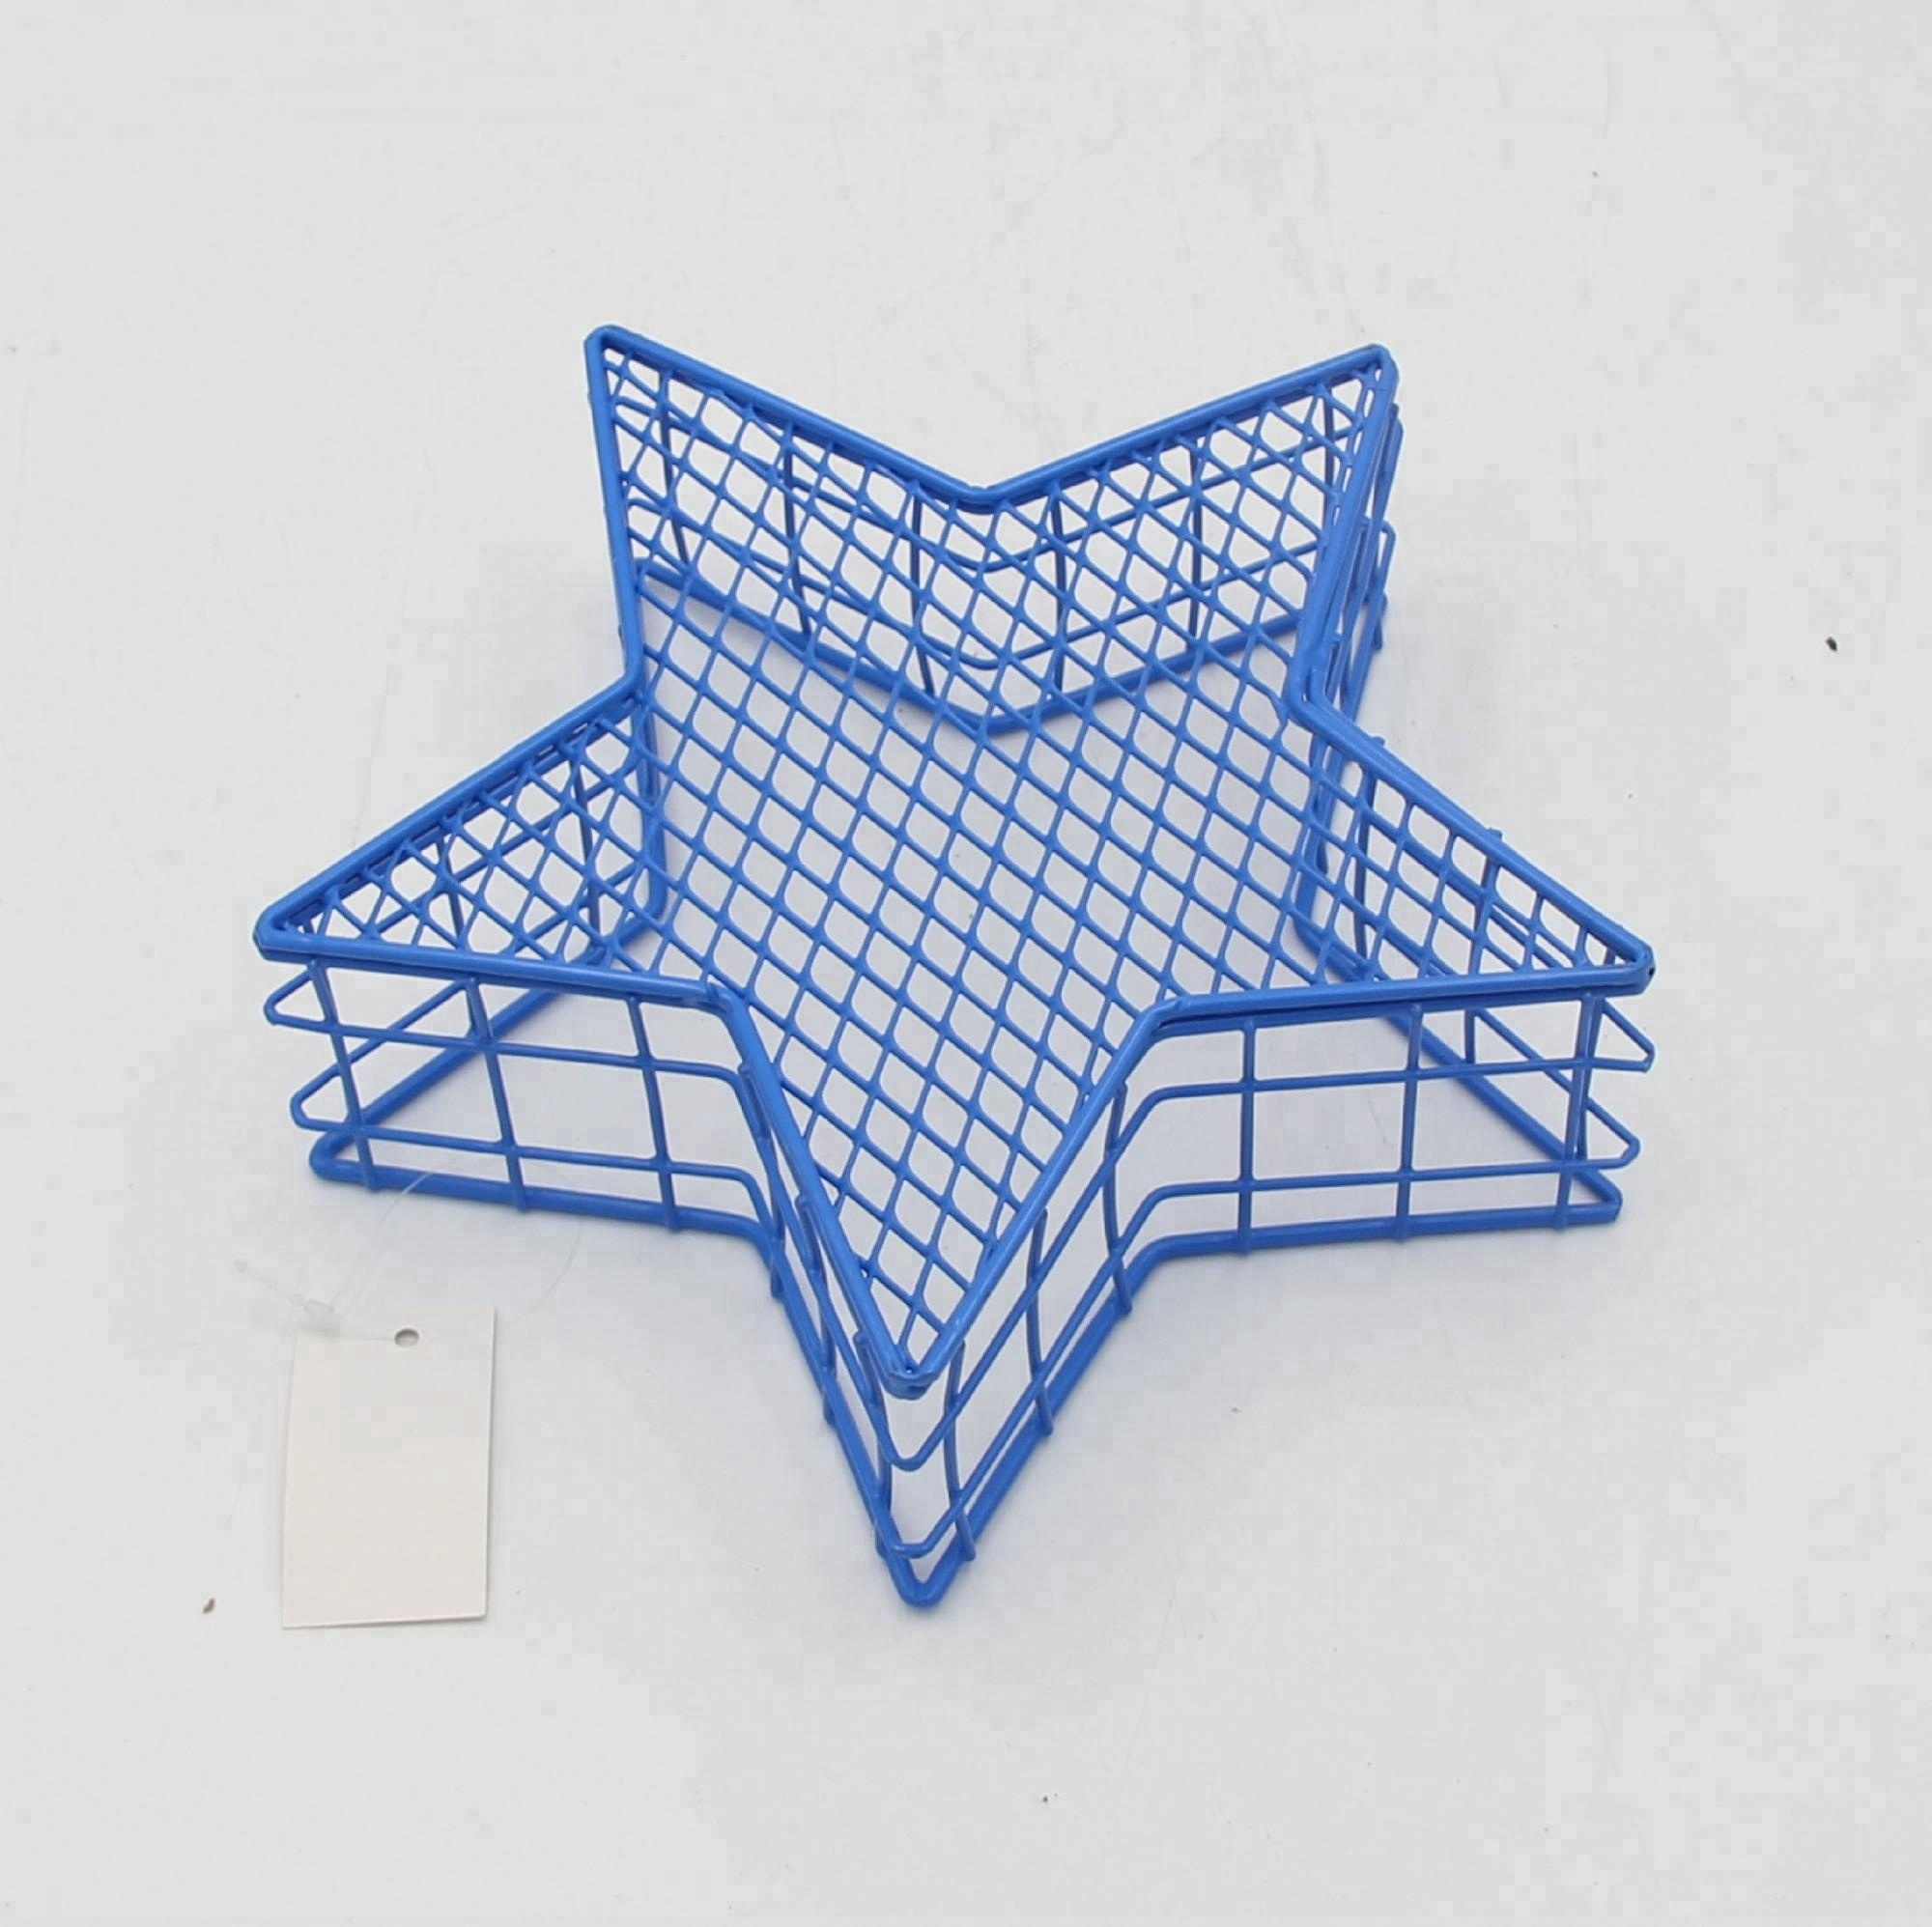 China Star Shaped Wire Basket, China Star Shaped Wire Basket ...